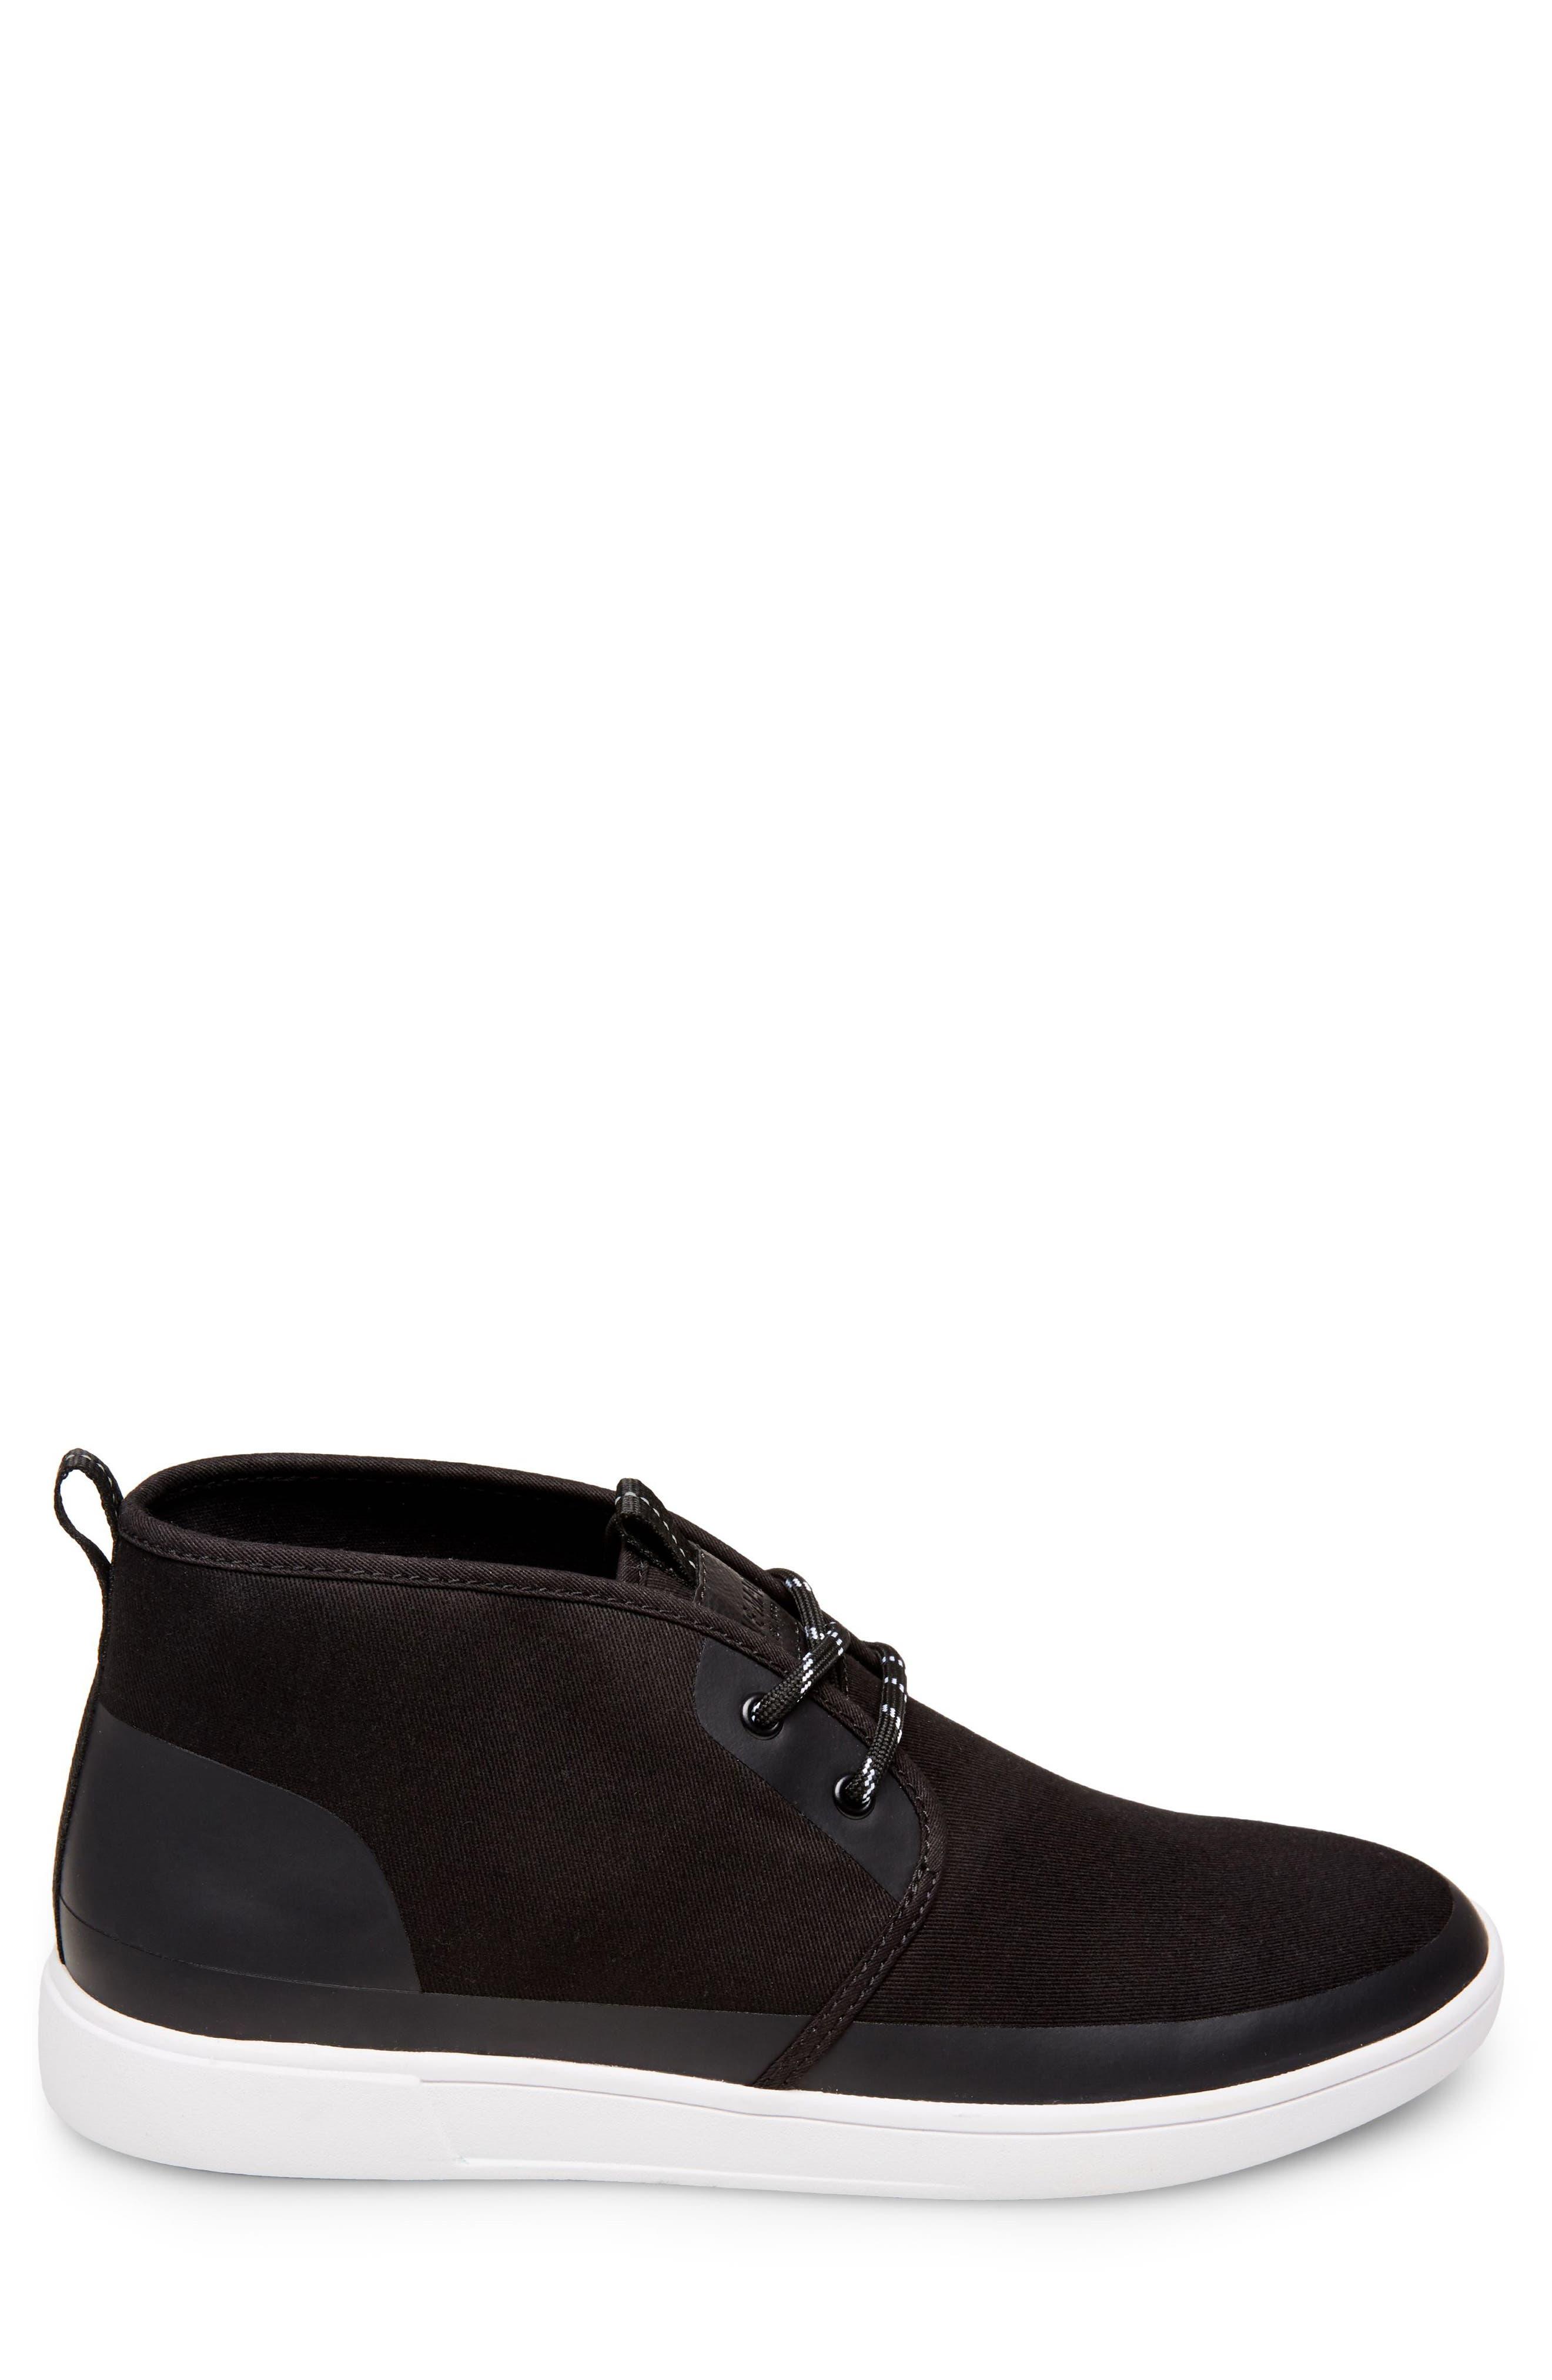 Franklyn Chukka Sneaker,                             Alternate thumbnail 3, color,                             Black Fabric